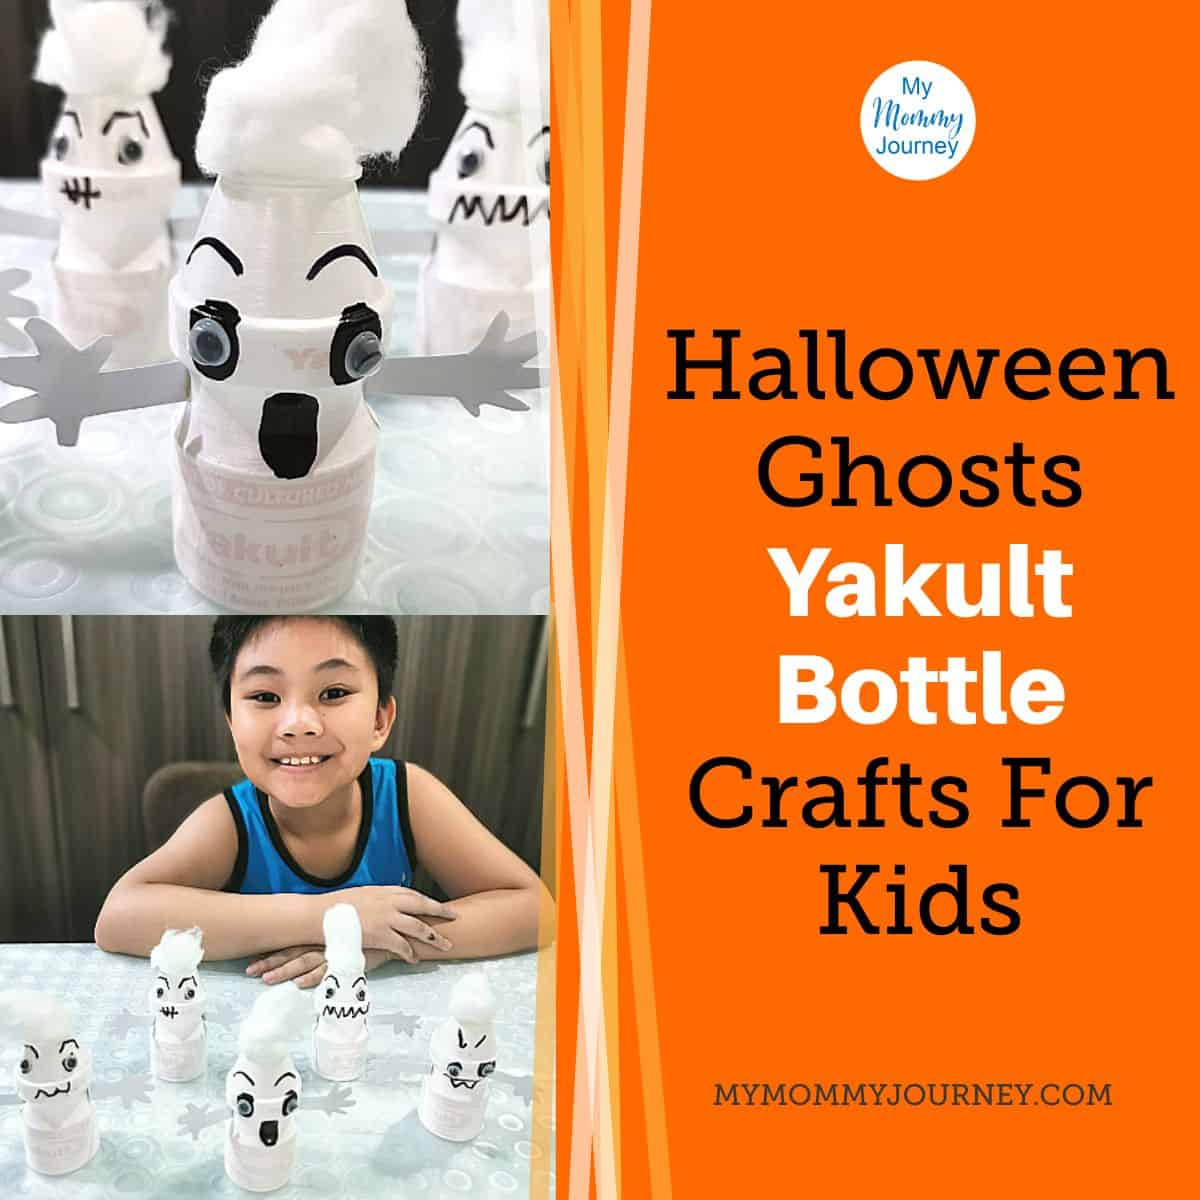 Halloween Ghosts Yakult Bottle Crafts for Kids